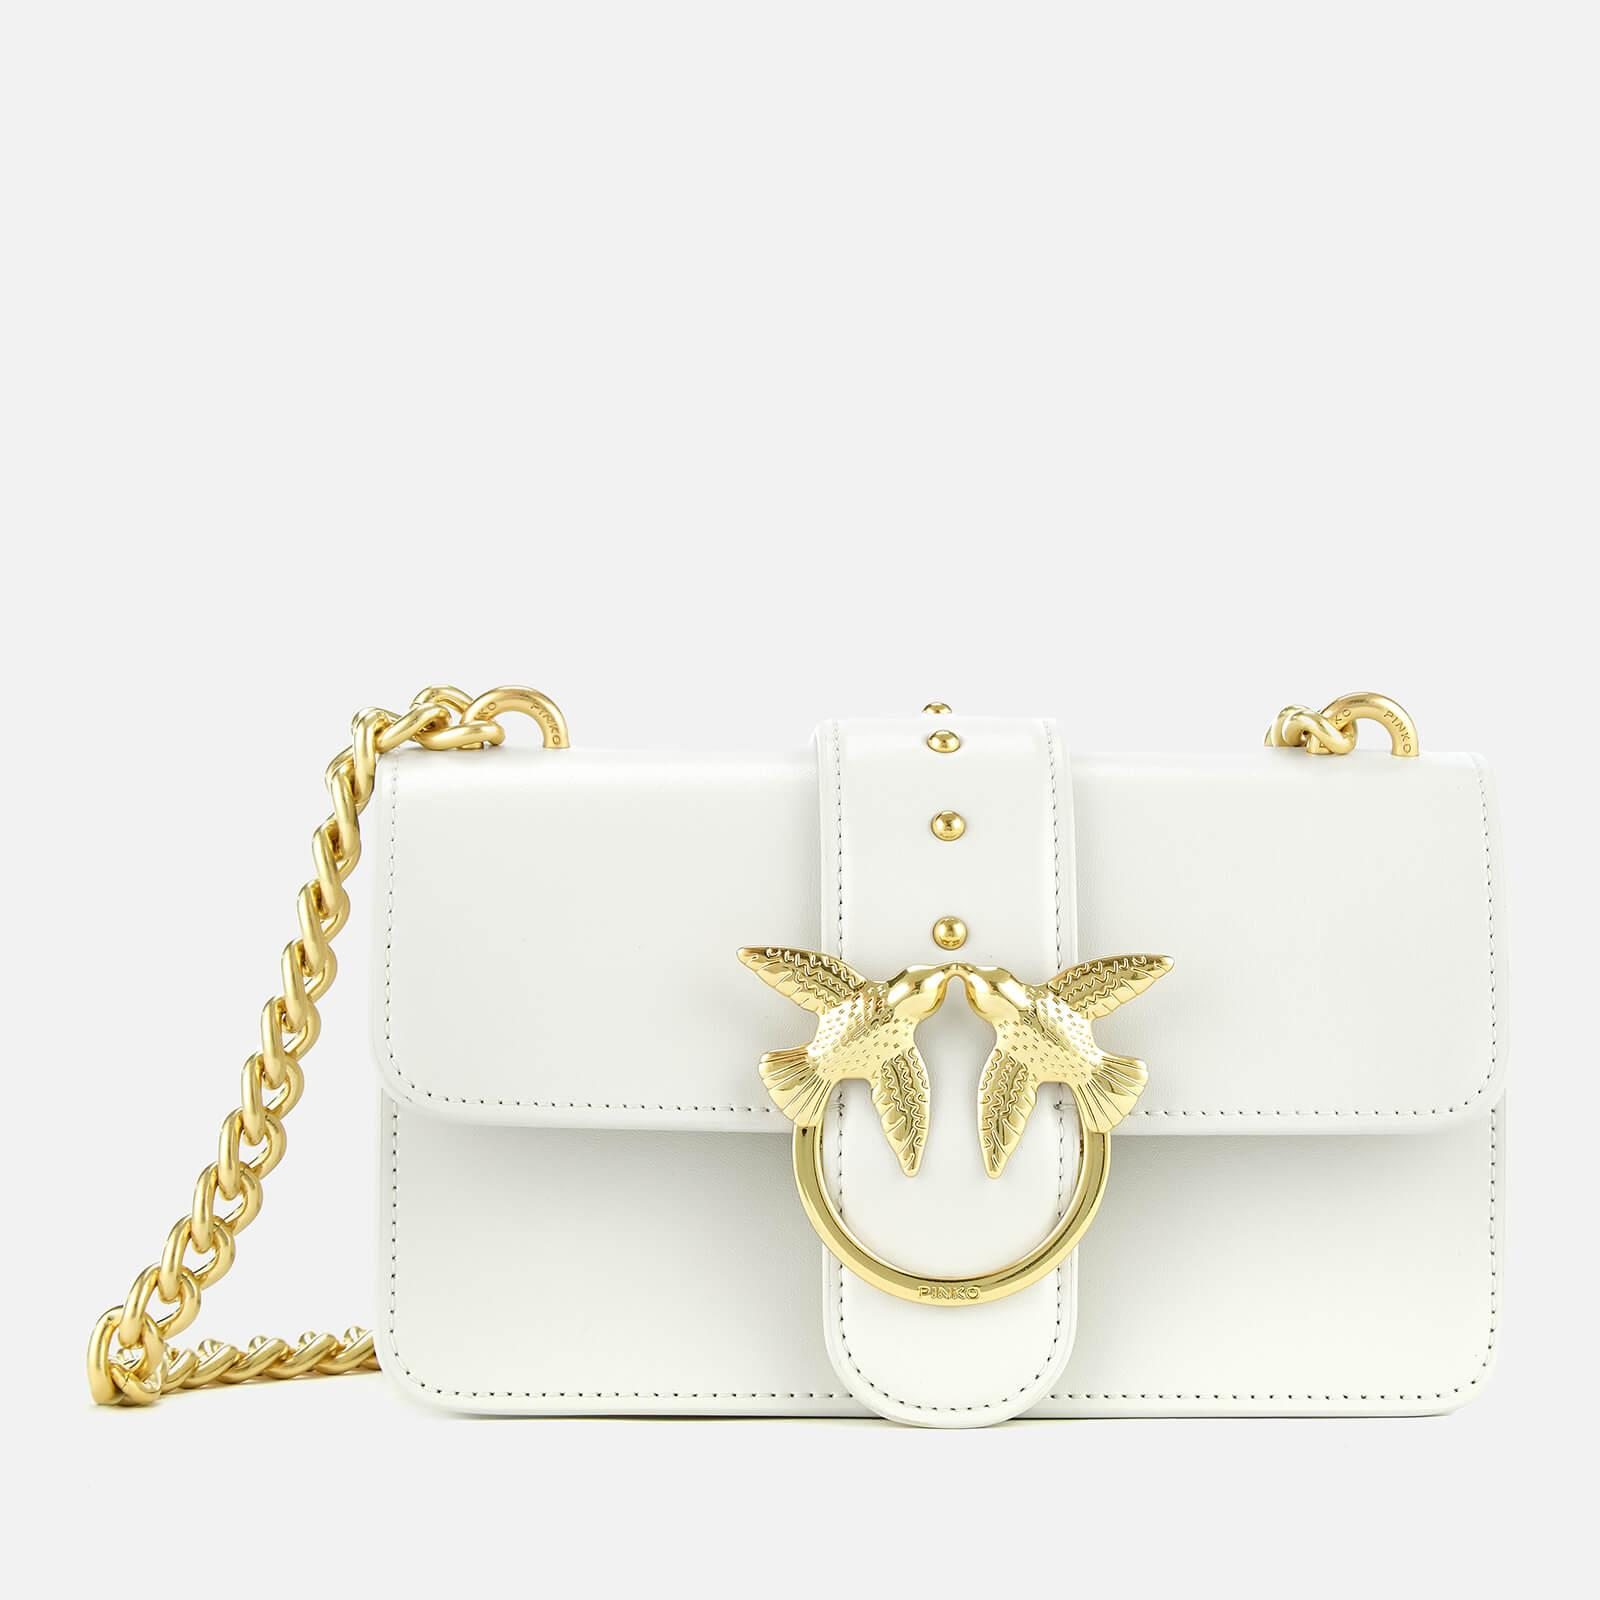 44af0240aa7 Pinko. Women's Mini Love Simply Shoulder Bag